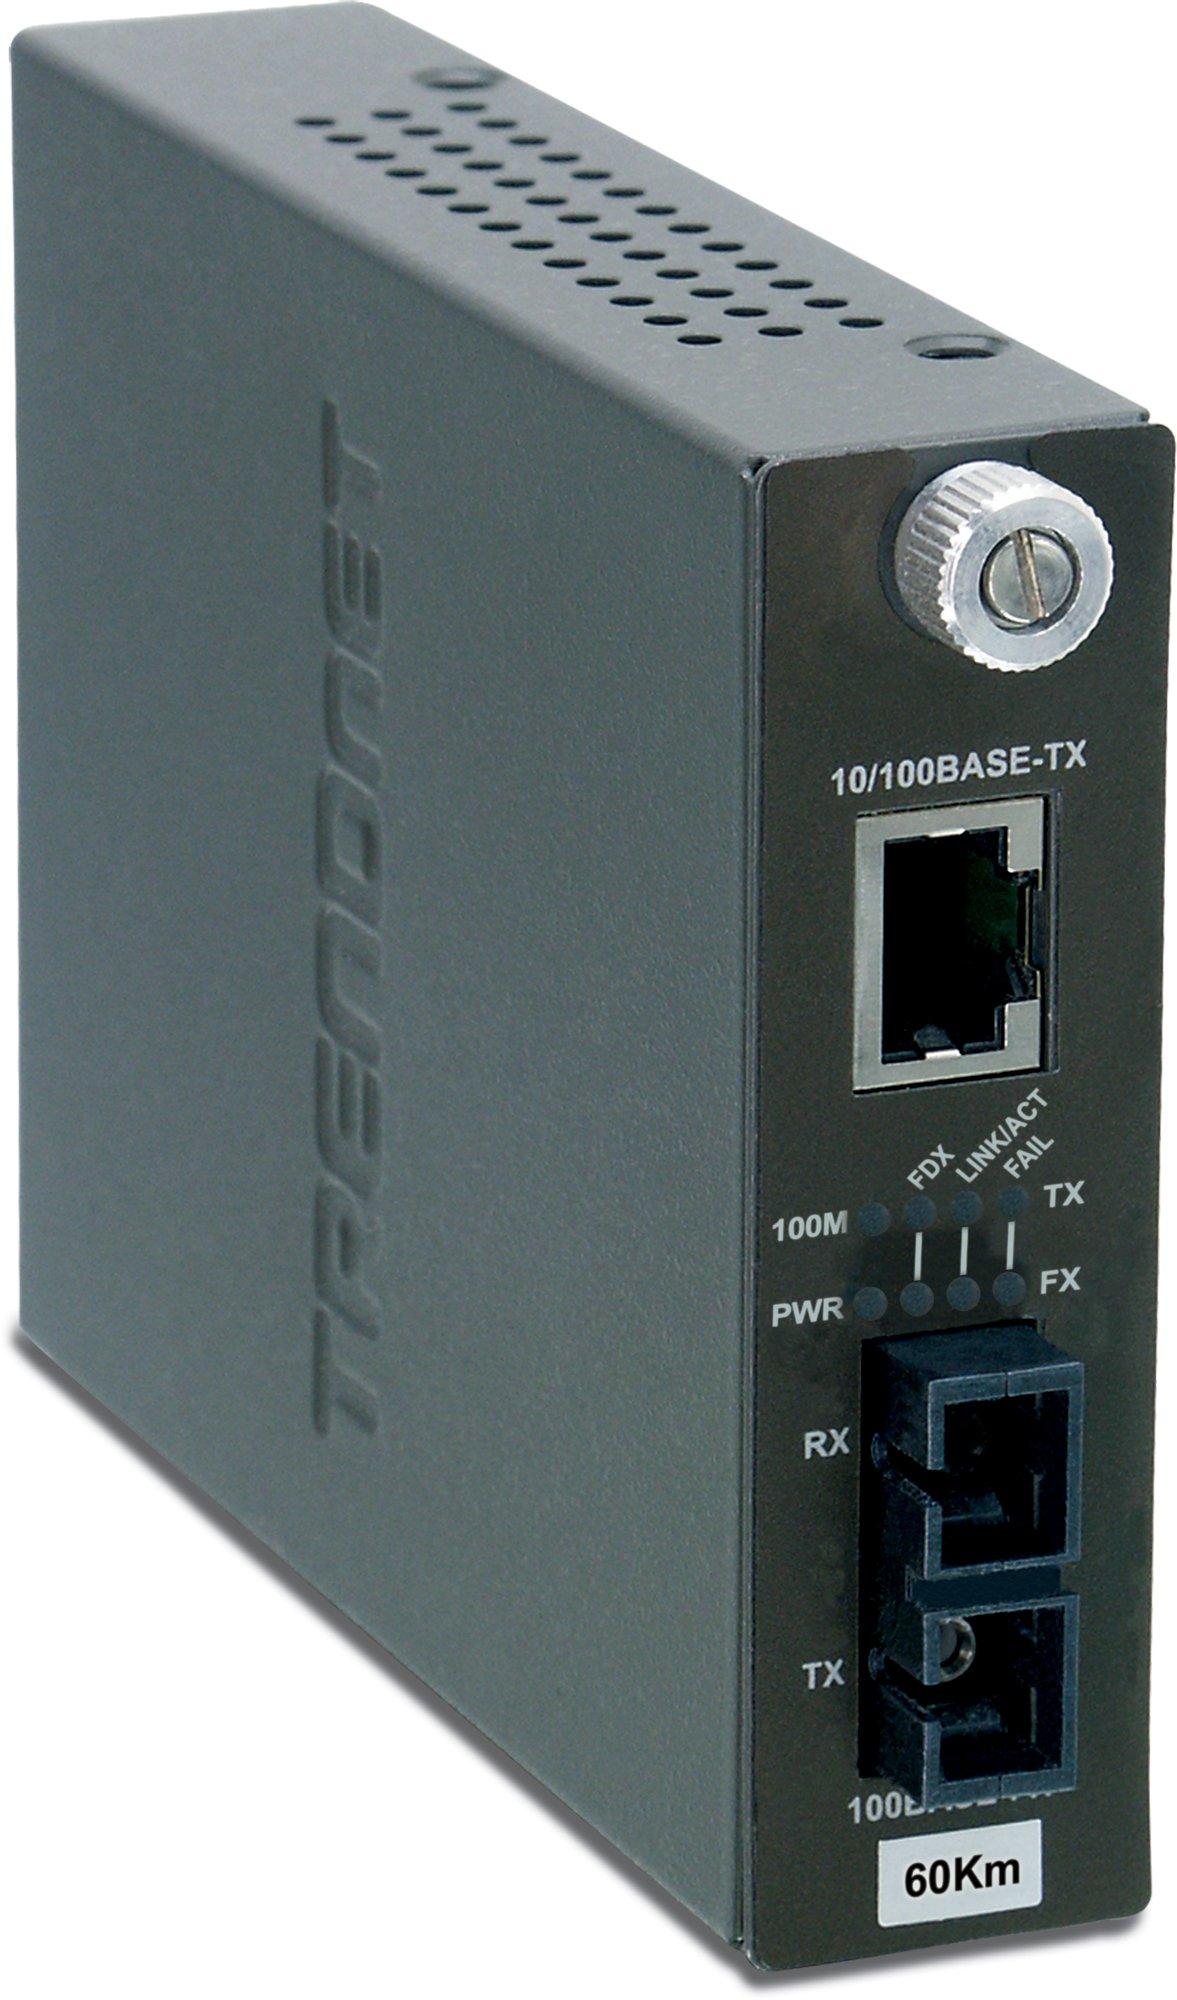 TRENDnet Intelligent 10/100Base-TX to 100Base-FX Single Mode SC Fiber Converter (60Km /37.3 Miles),TFC-110S60i